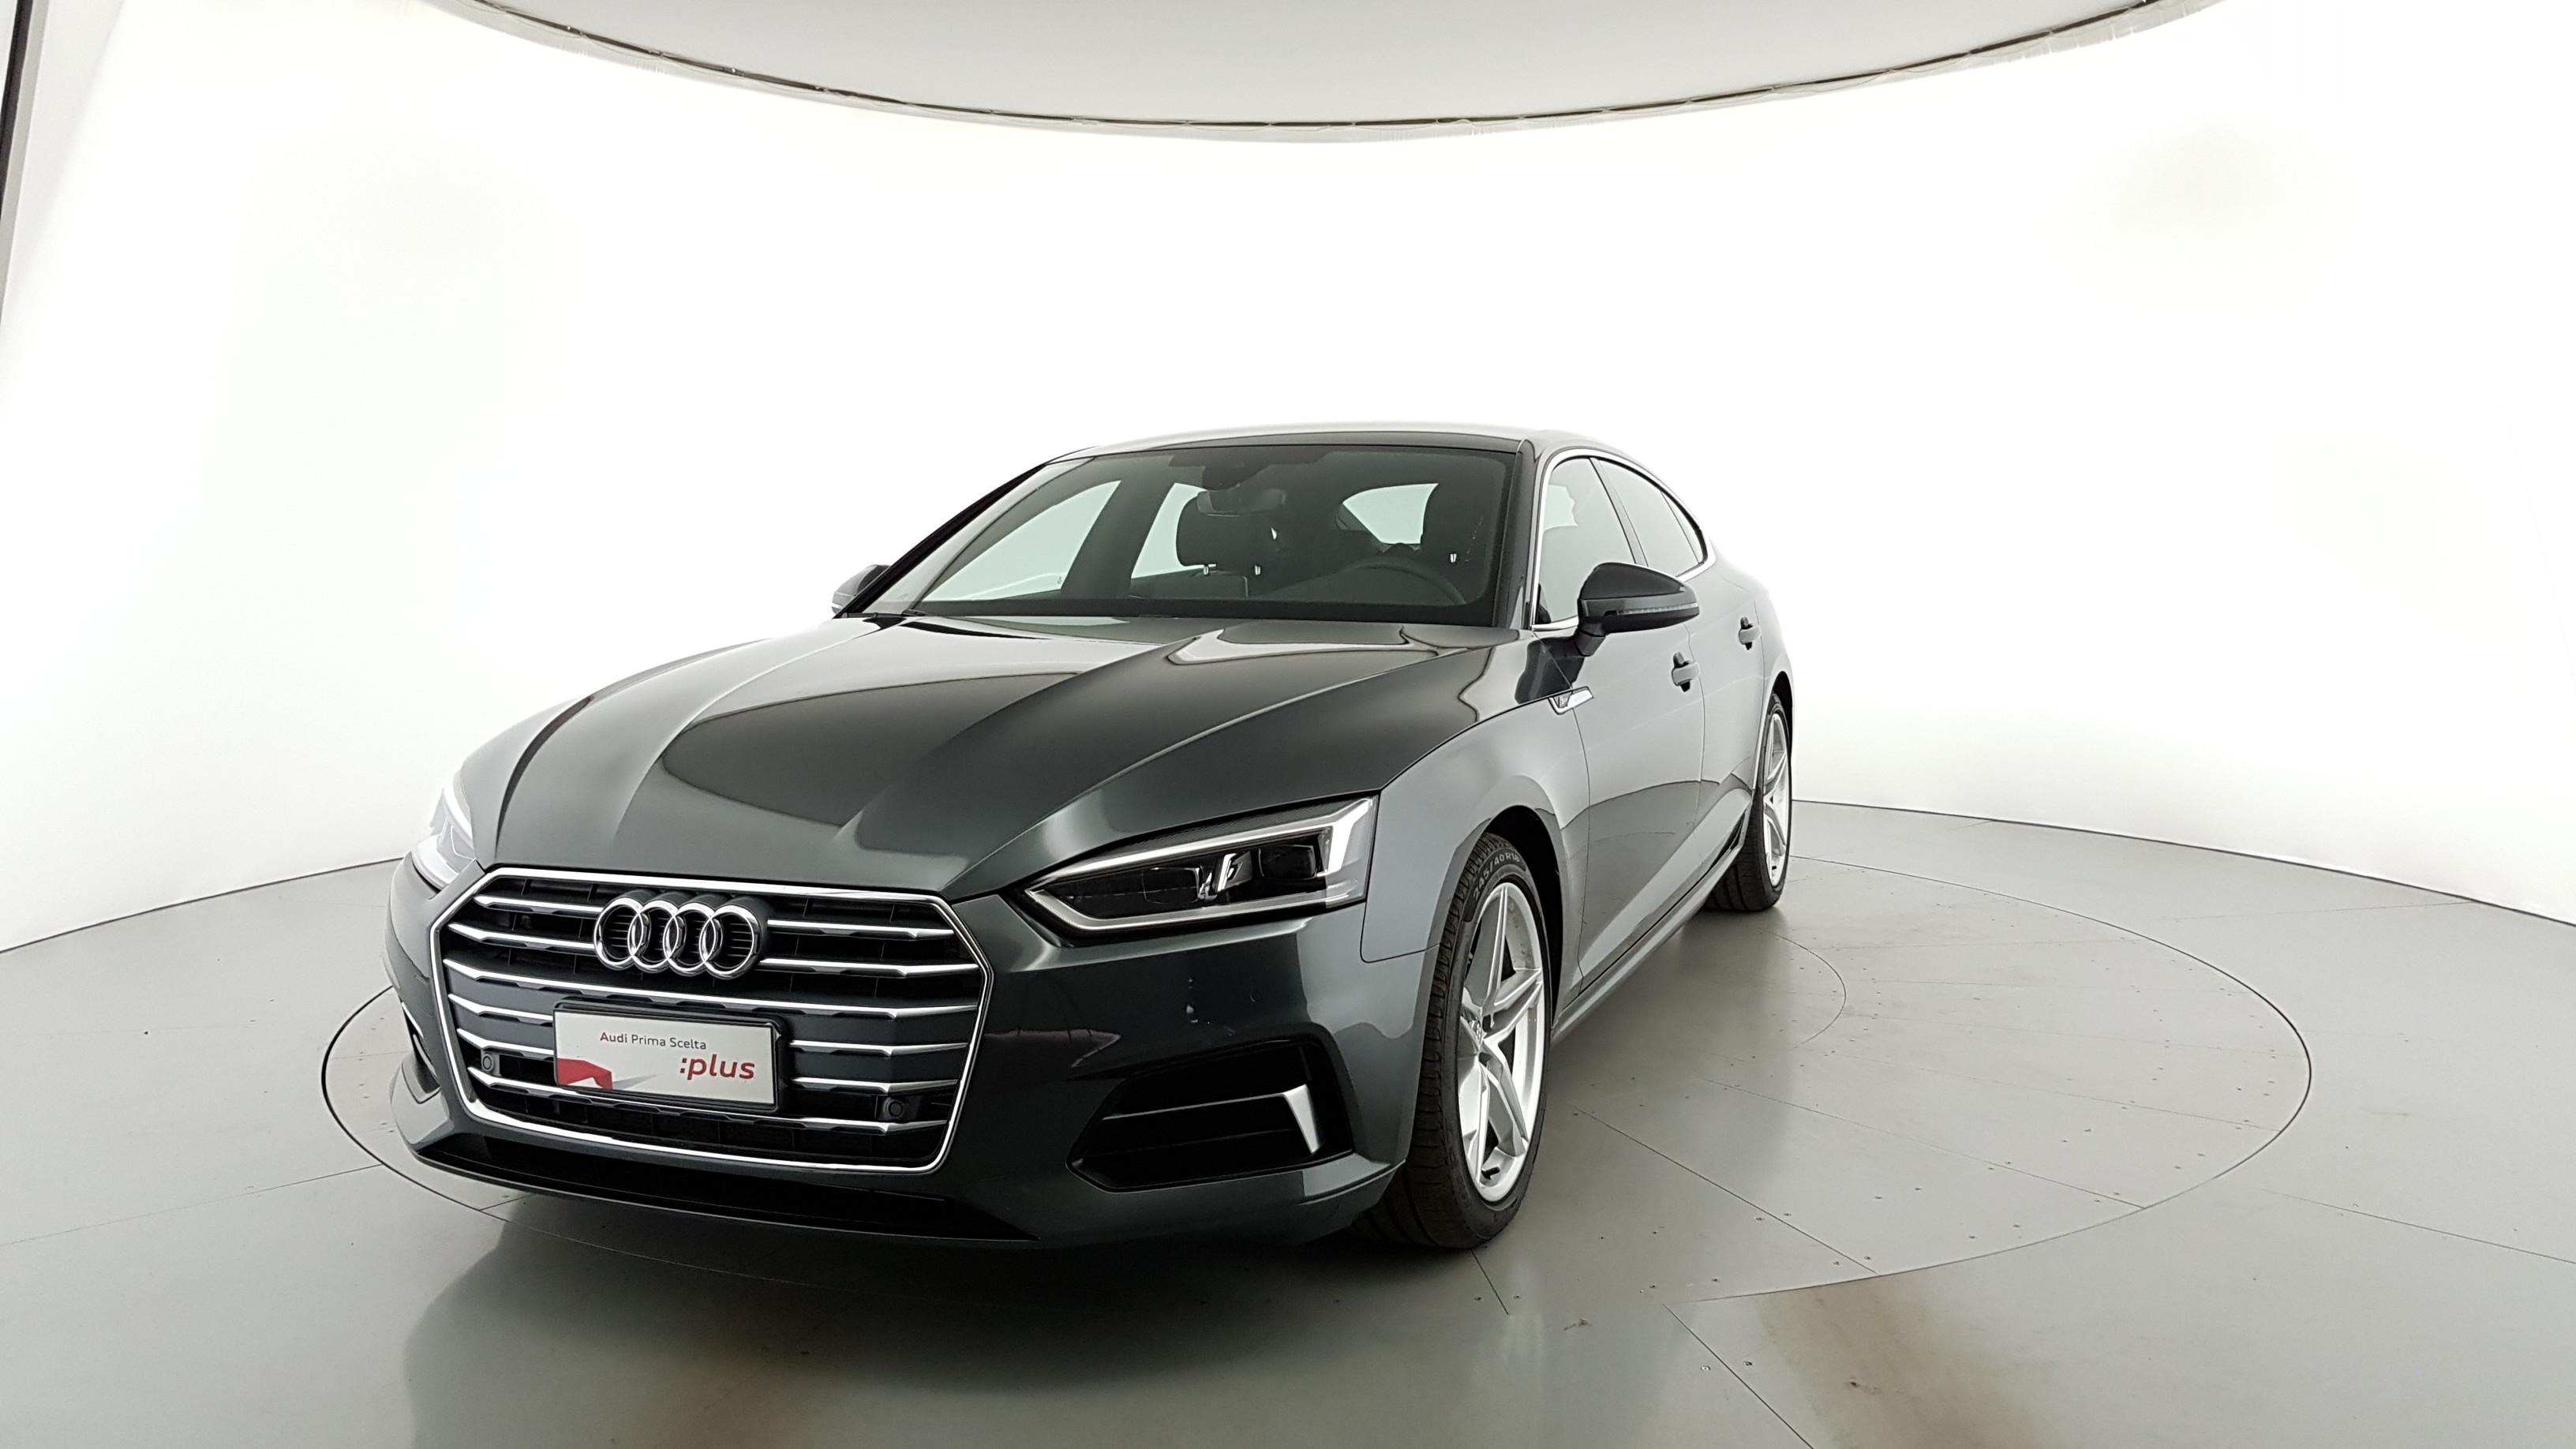 Audi A5 SPORTBACK F5ABFG-19